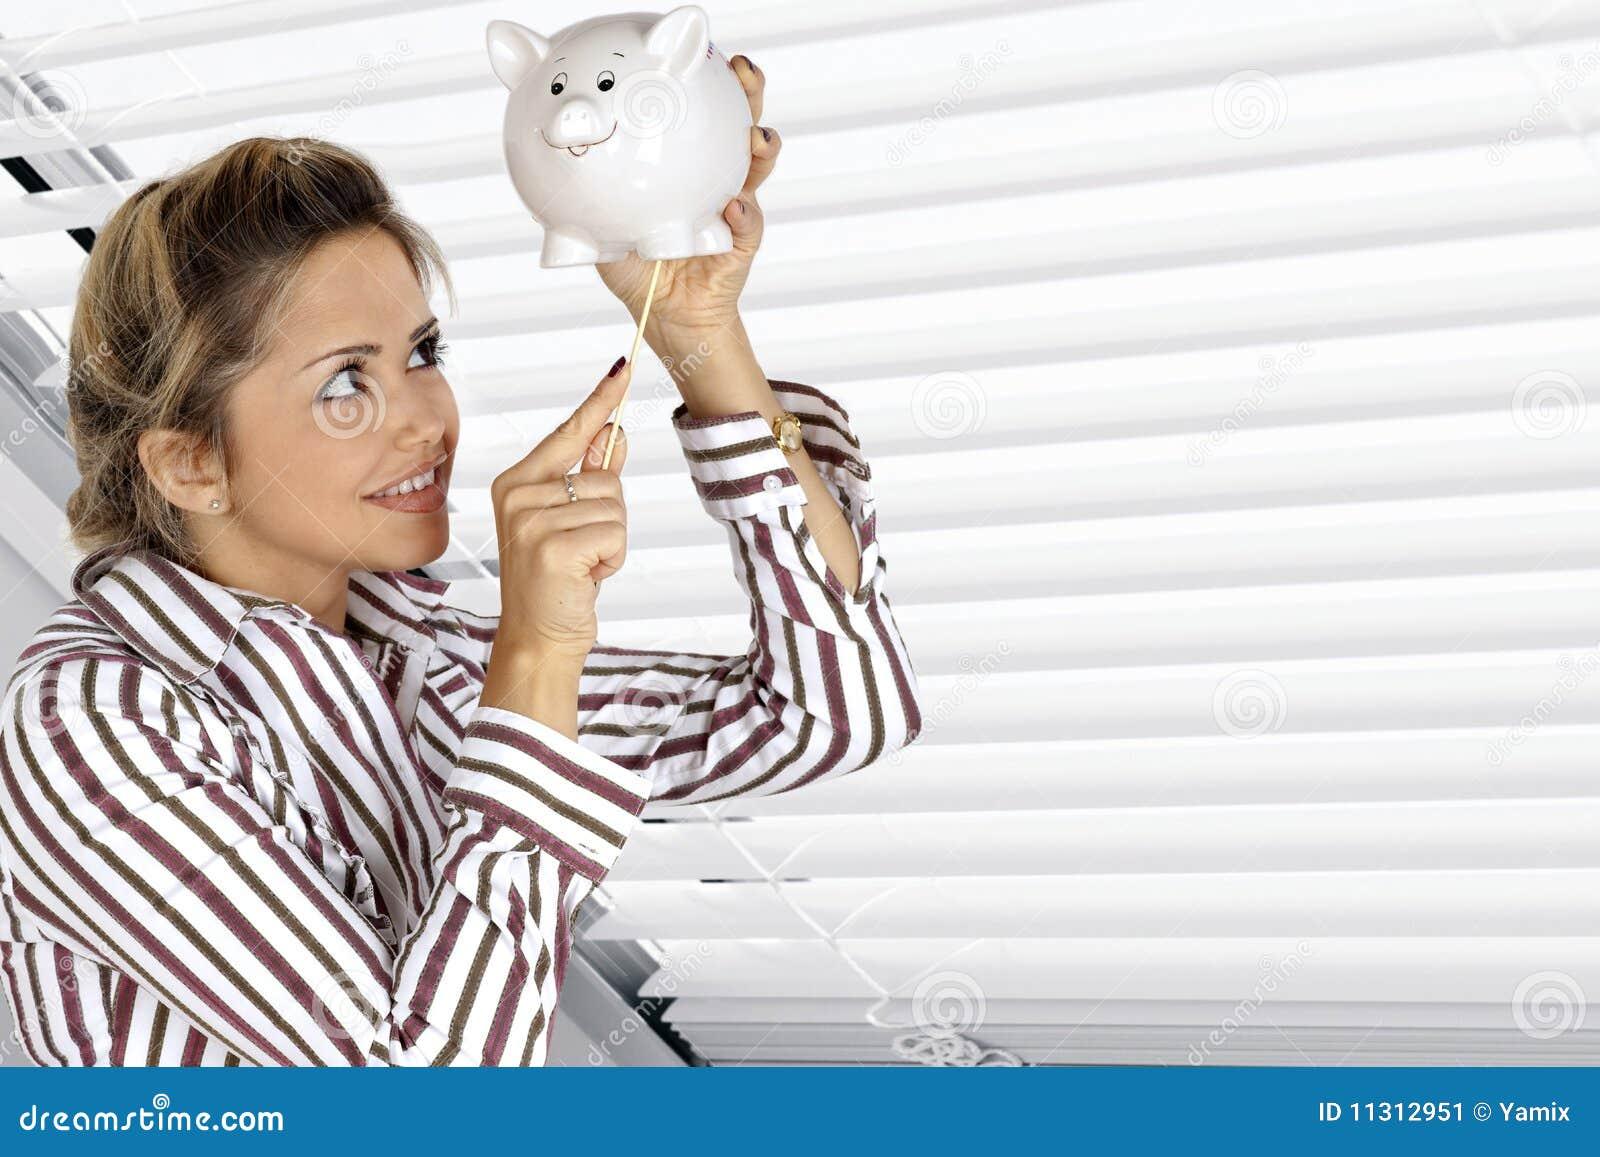 Frau und Piggy Querneigung